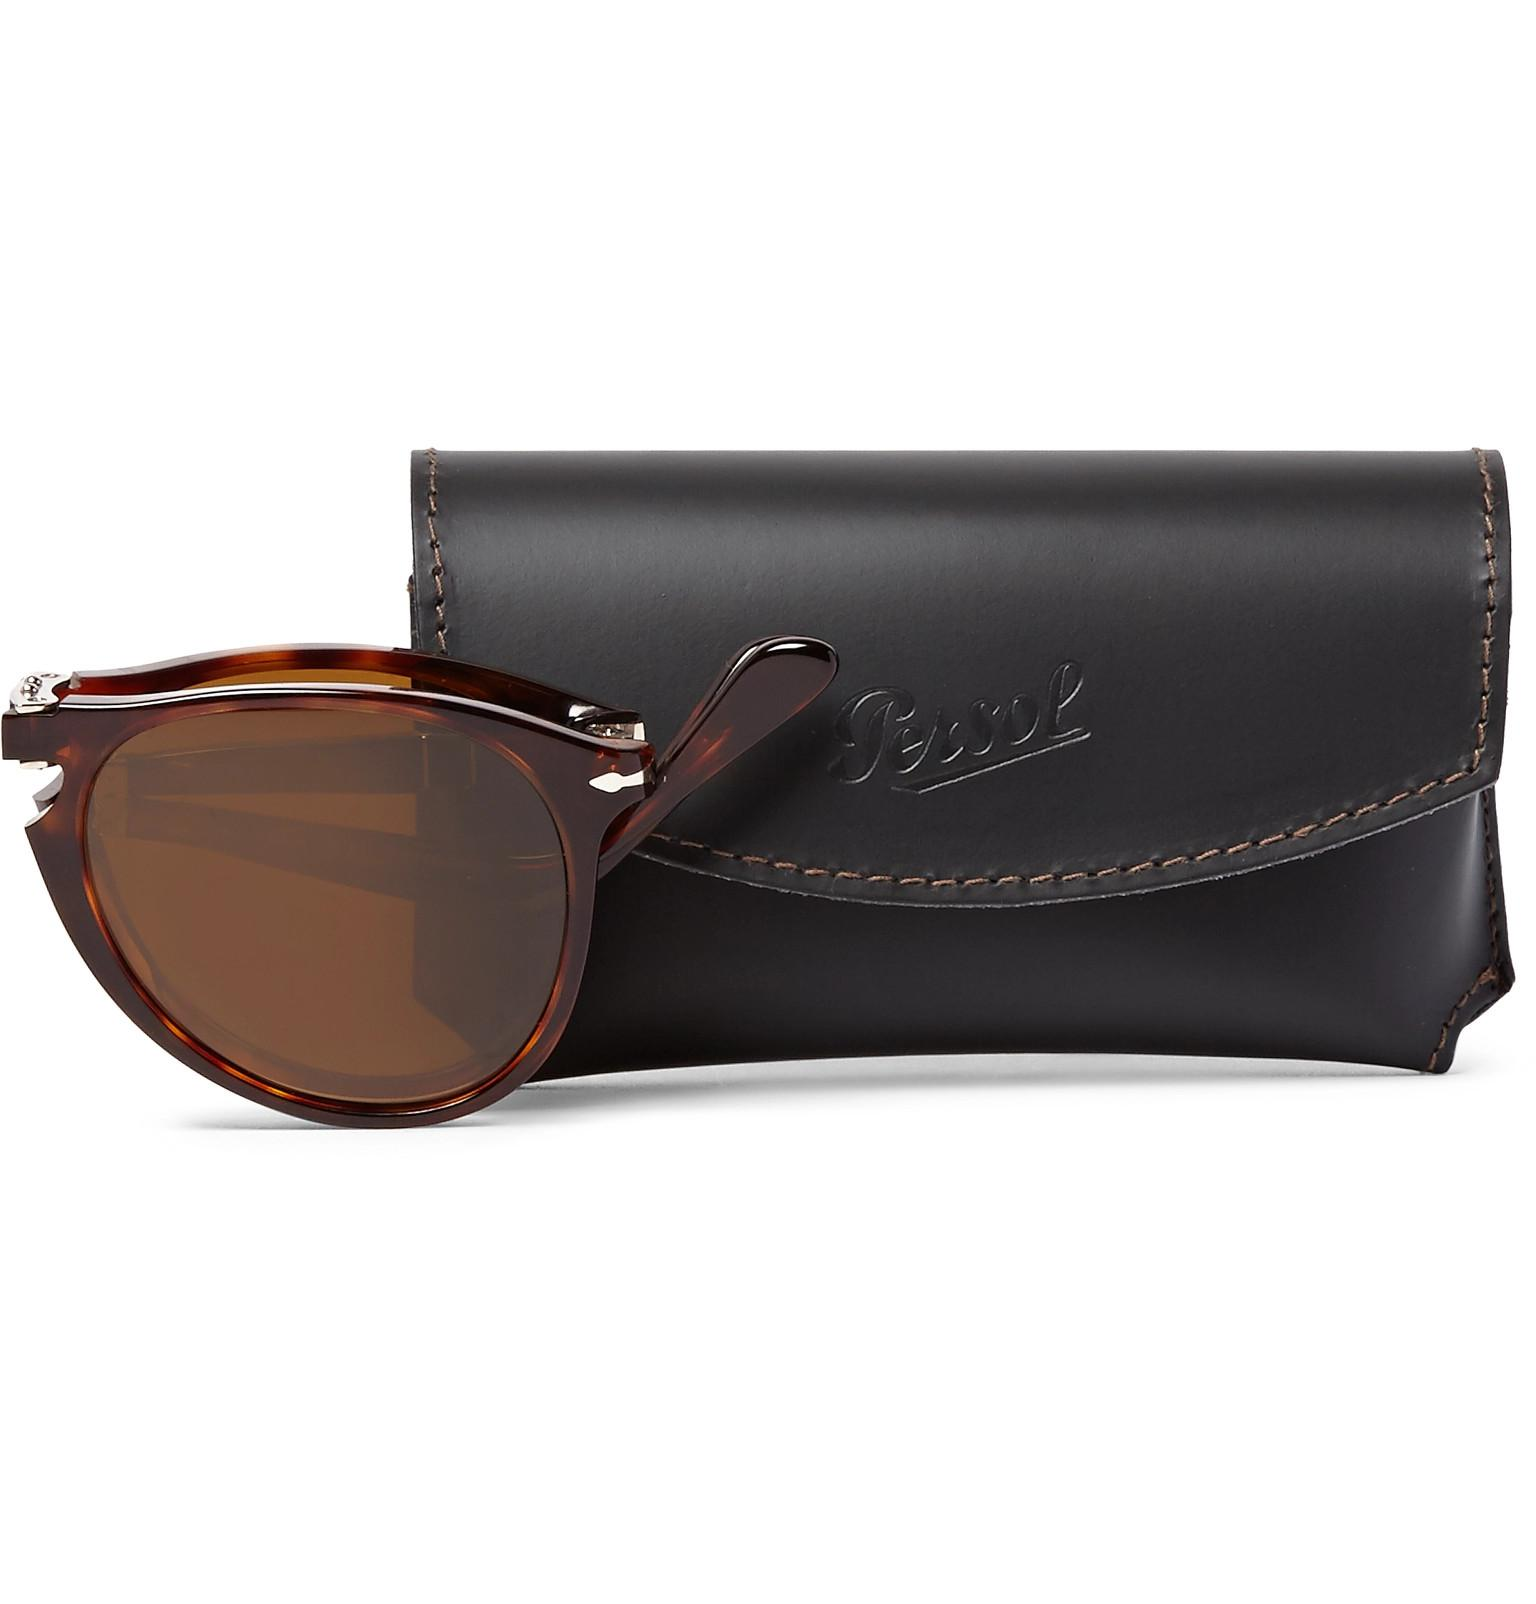 33b54dea56 Persol 714 Foldable D-frame Tortoiseshell Acetate Sunglasses in ...